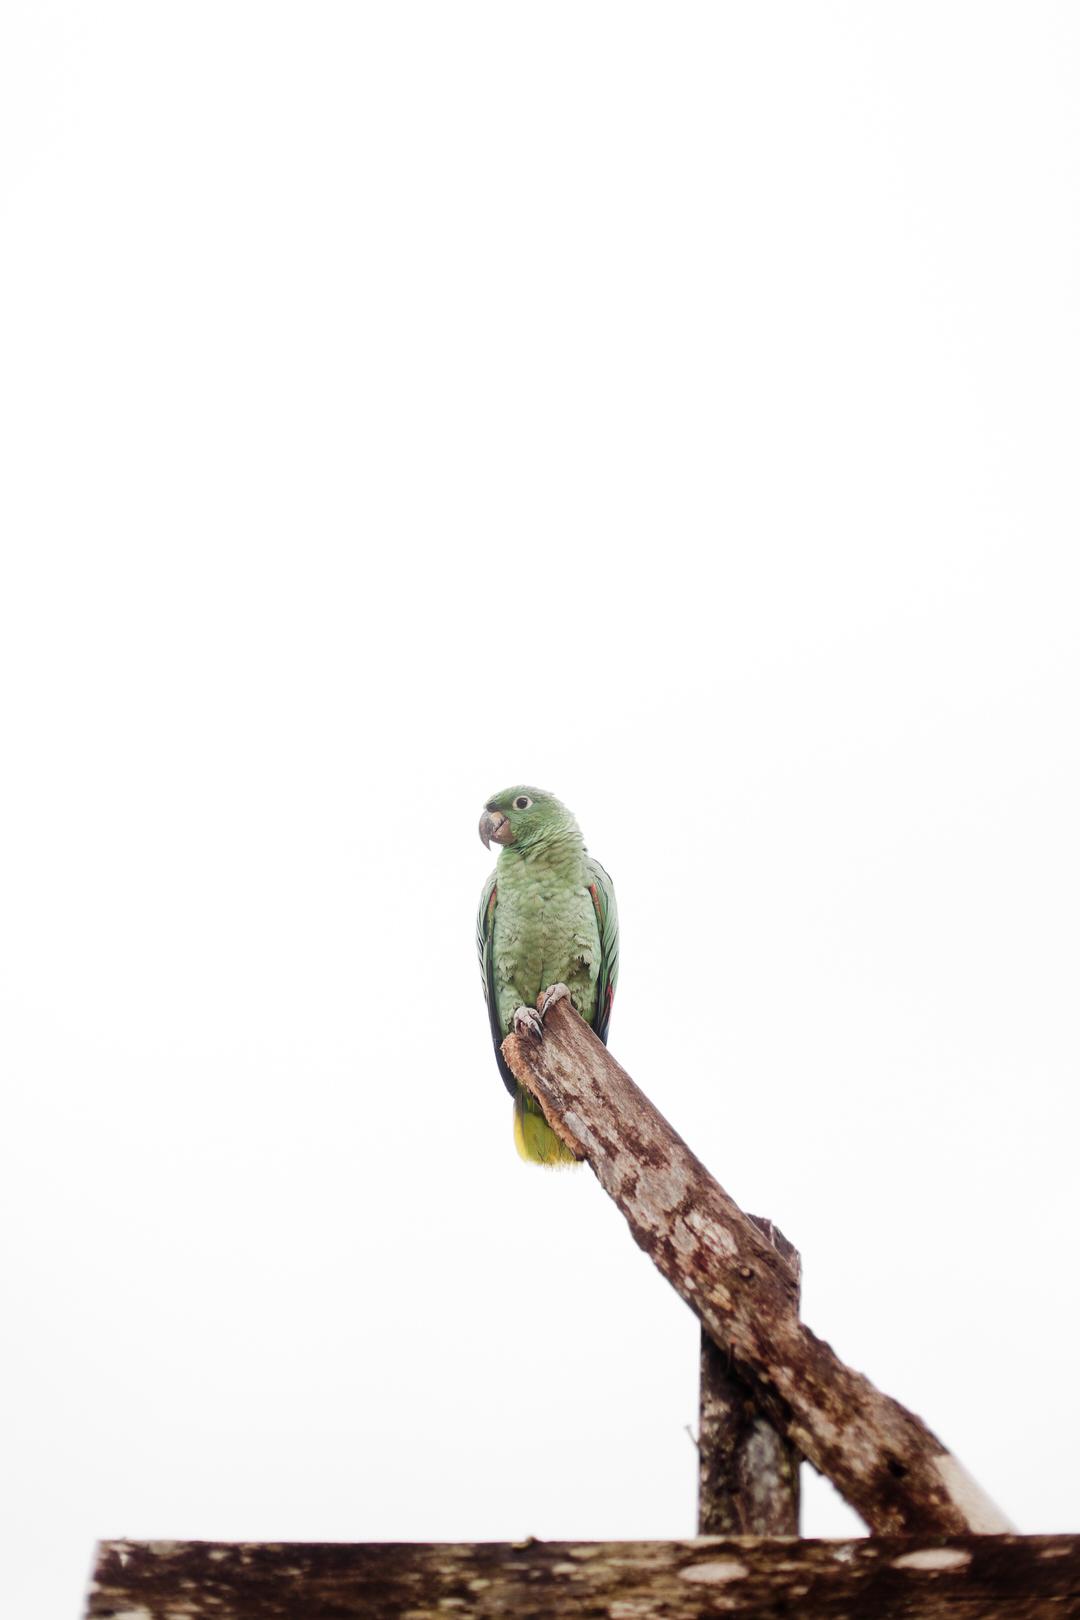 melissa kruse photography - chinimp tuna station, amazon, ecuador-38.jpg